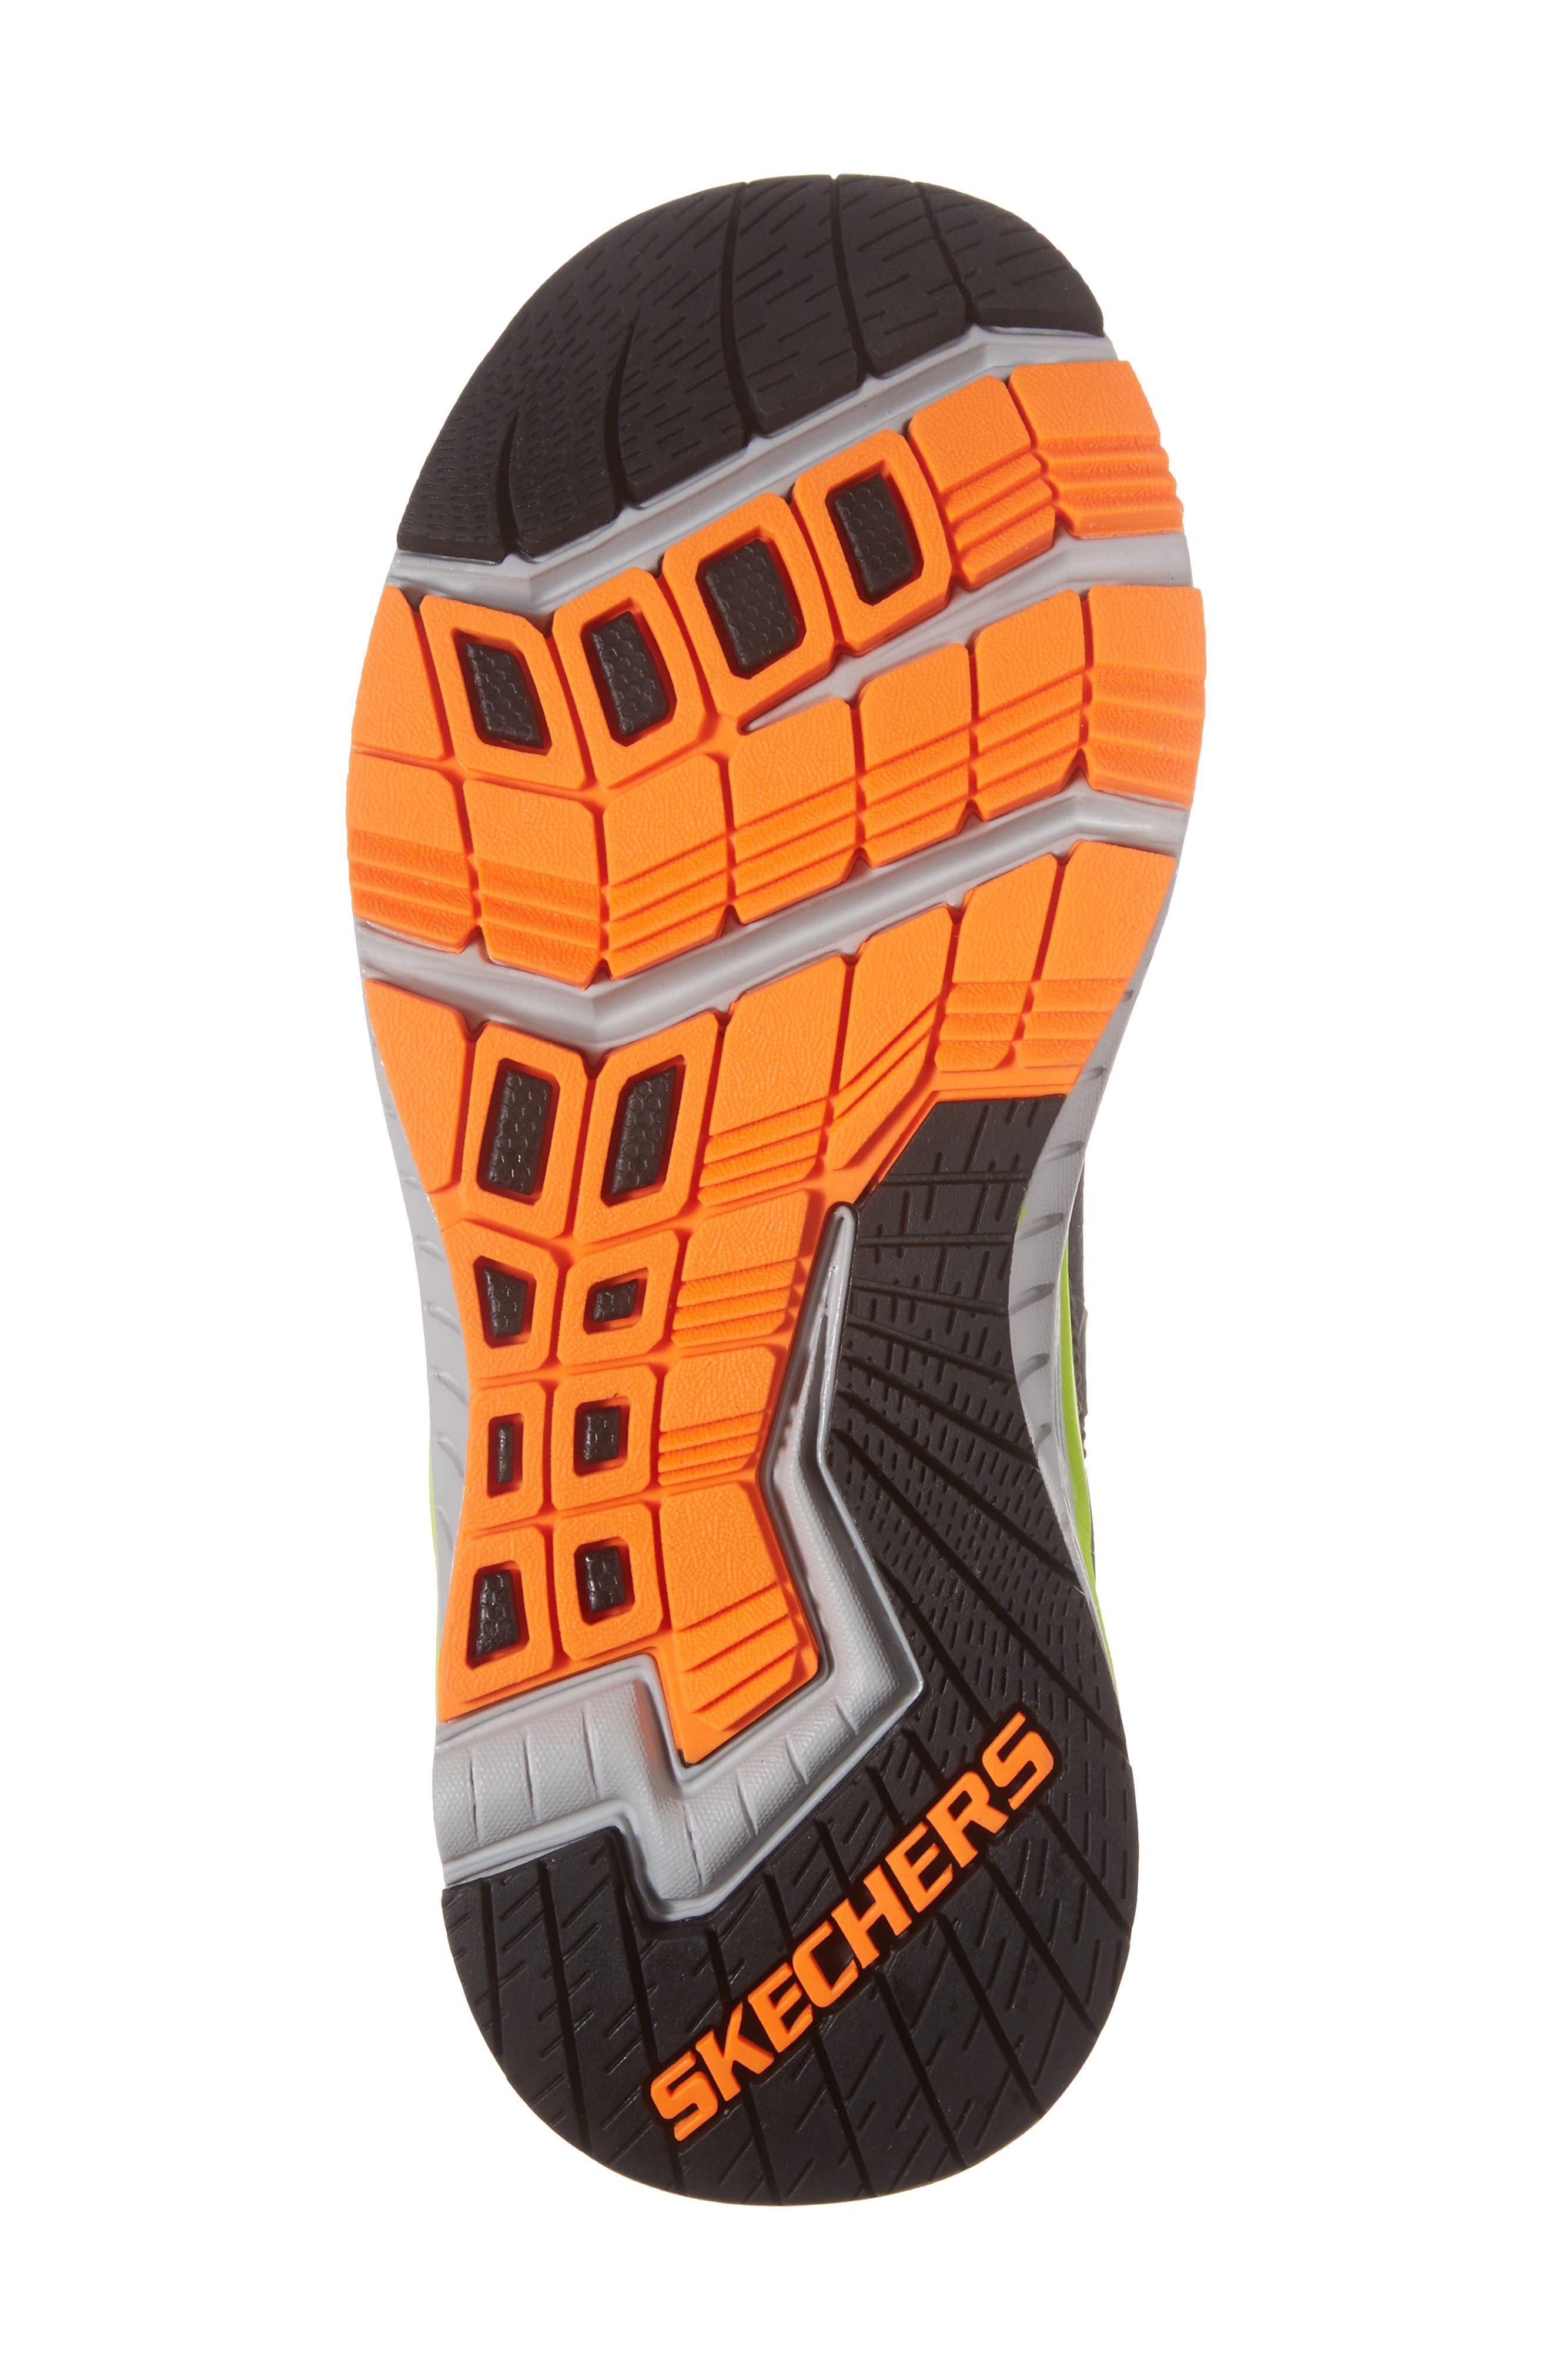 Hyperjolt Sneaker,                             Alternate thumbnail 6, color,                             Charcoal/ Black/ Lime